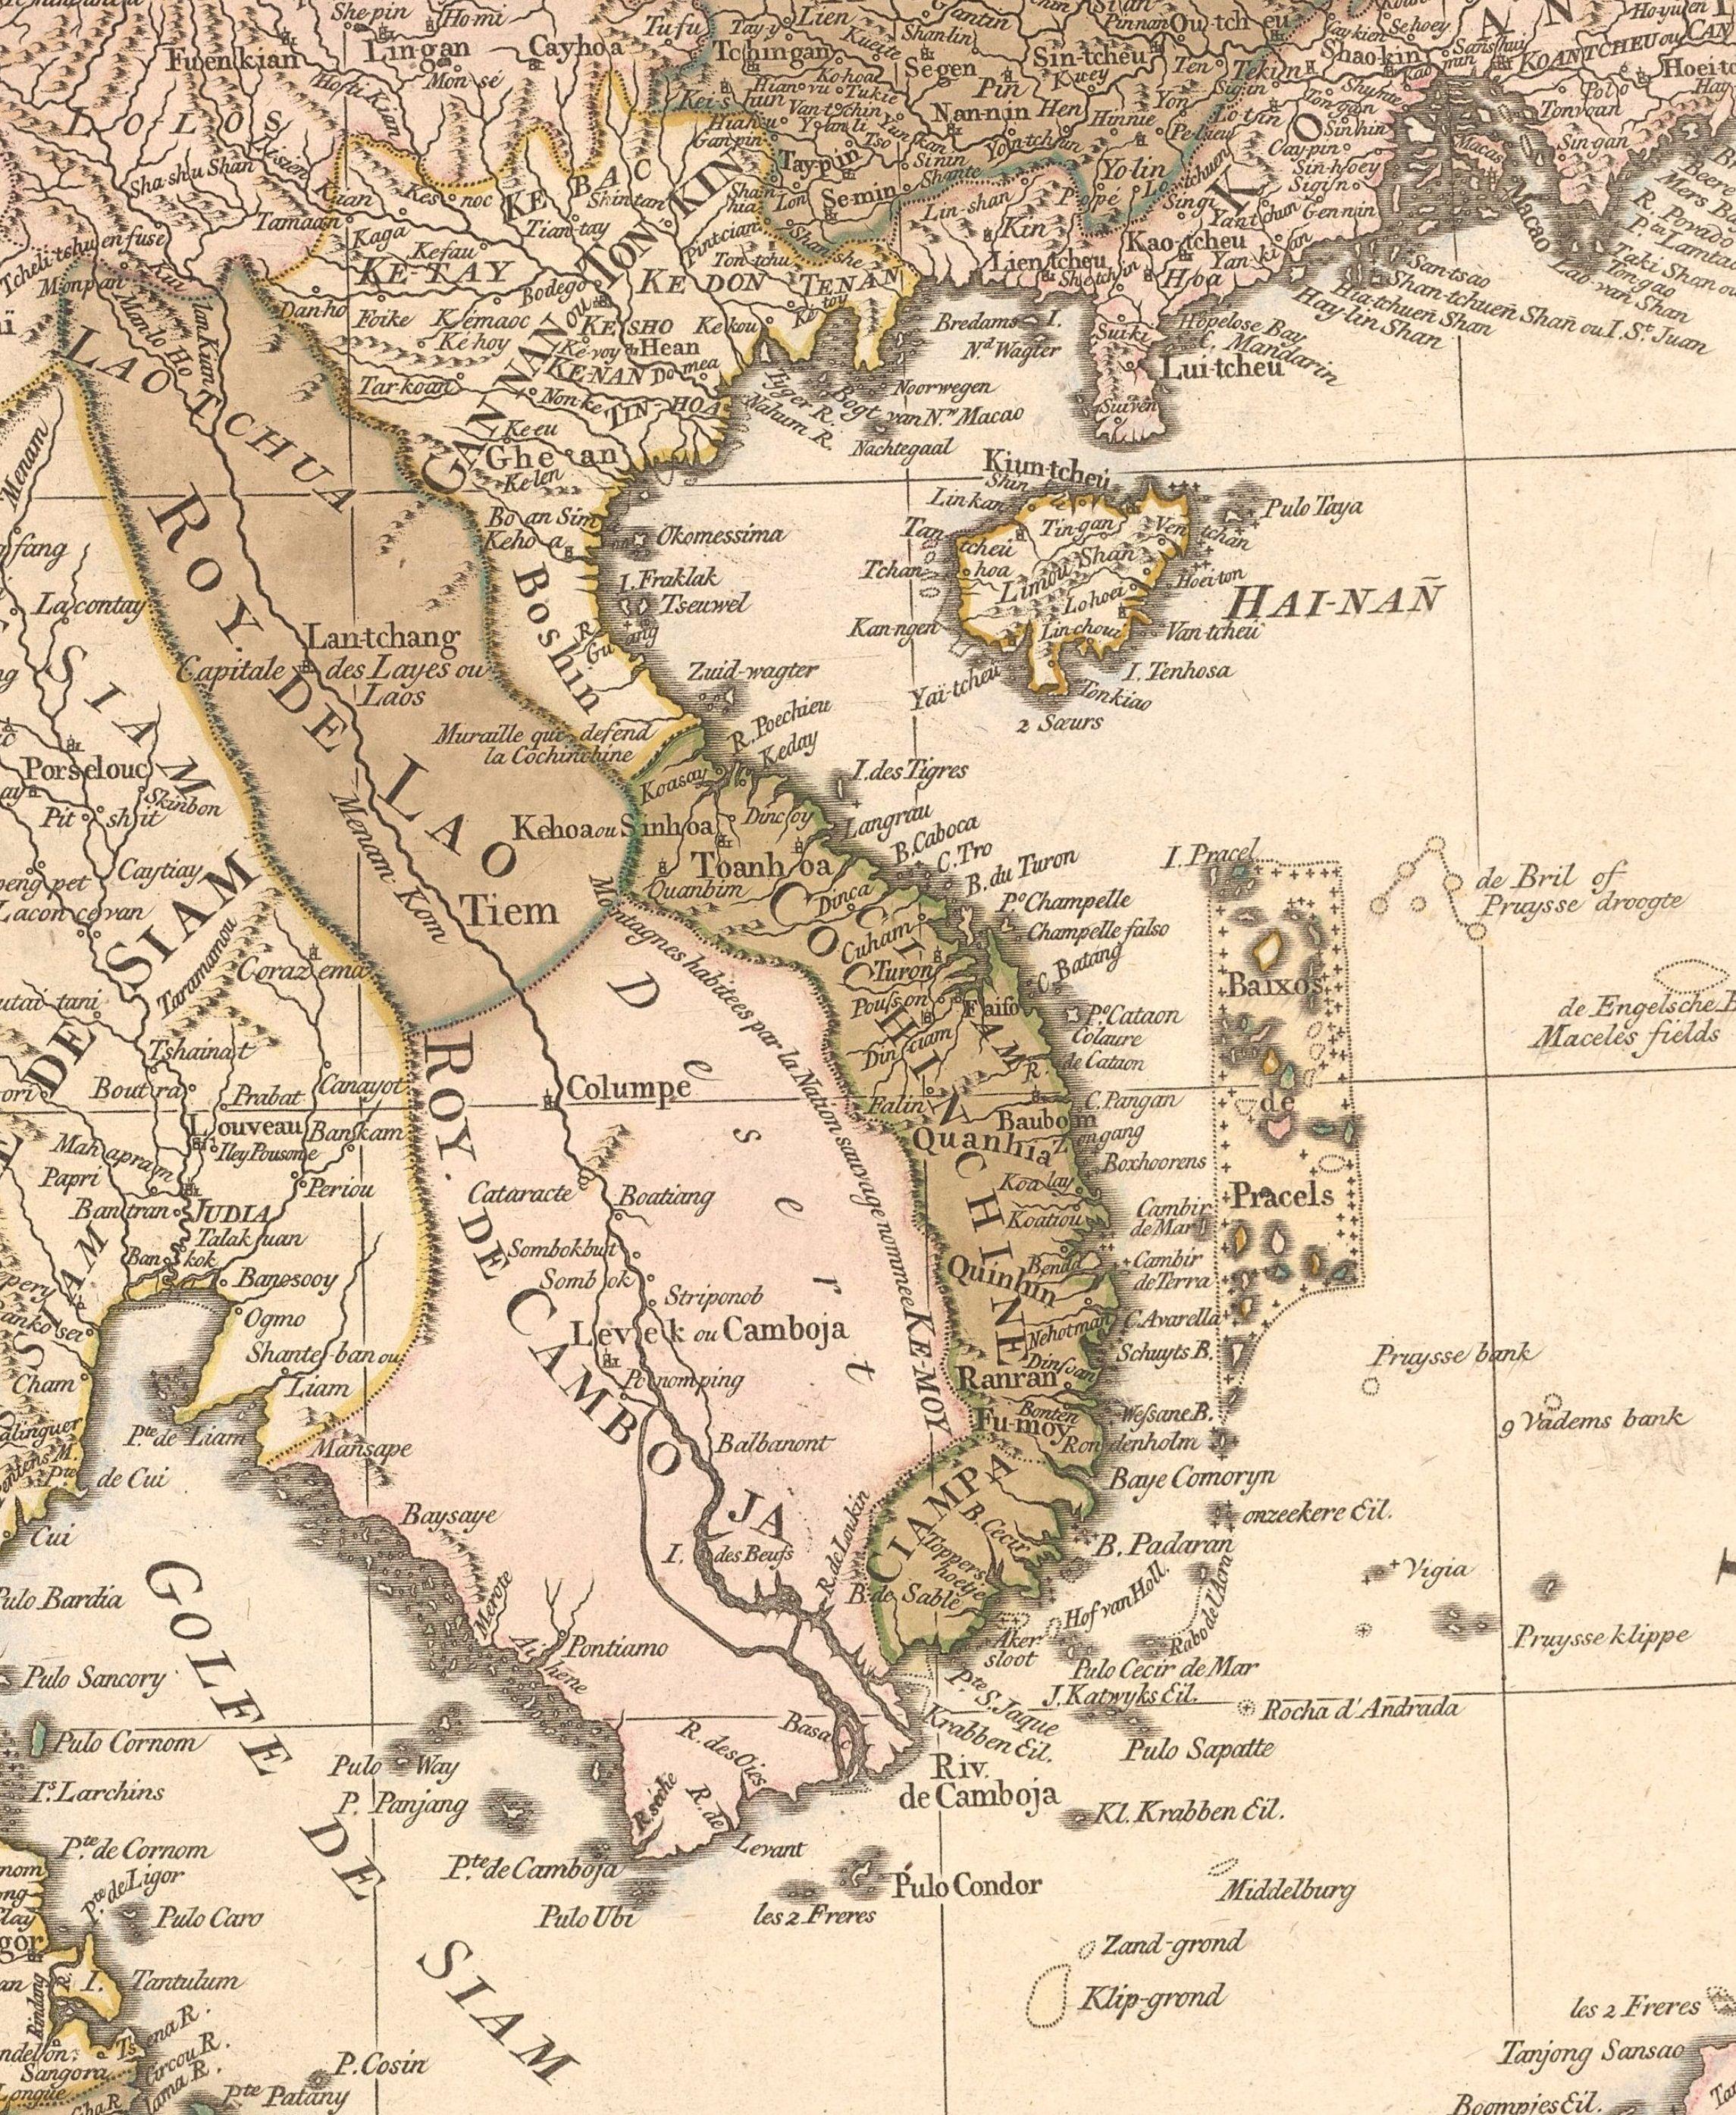 Vietnamkrieg Karte.Südostasien 1760 Karte Vietnam Laos Kambodscha Karten